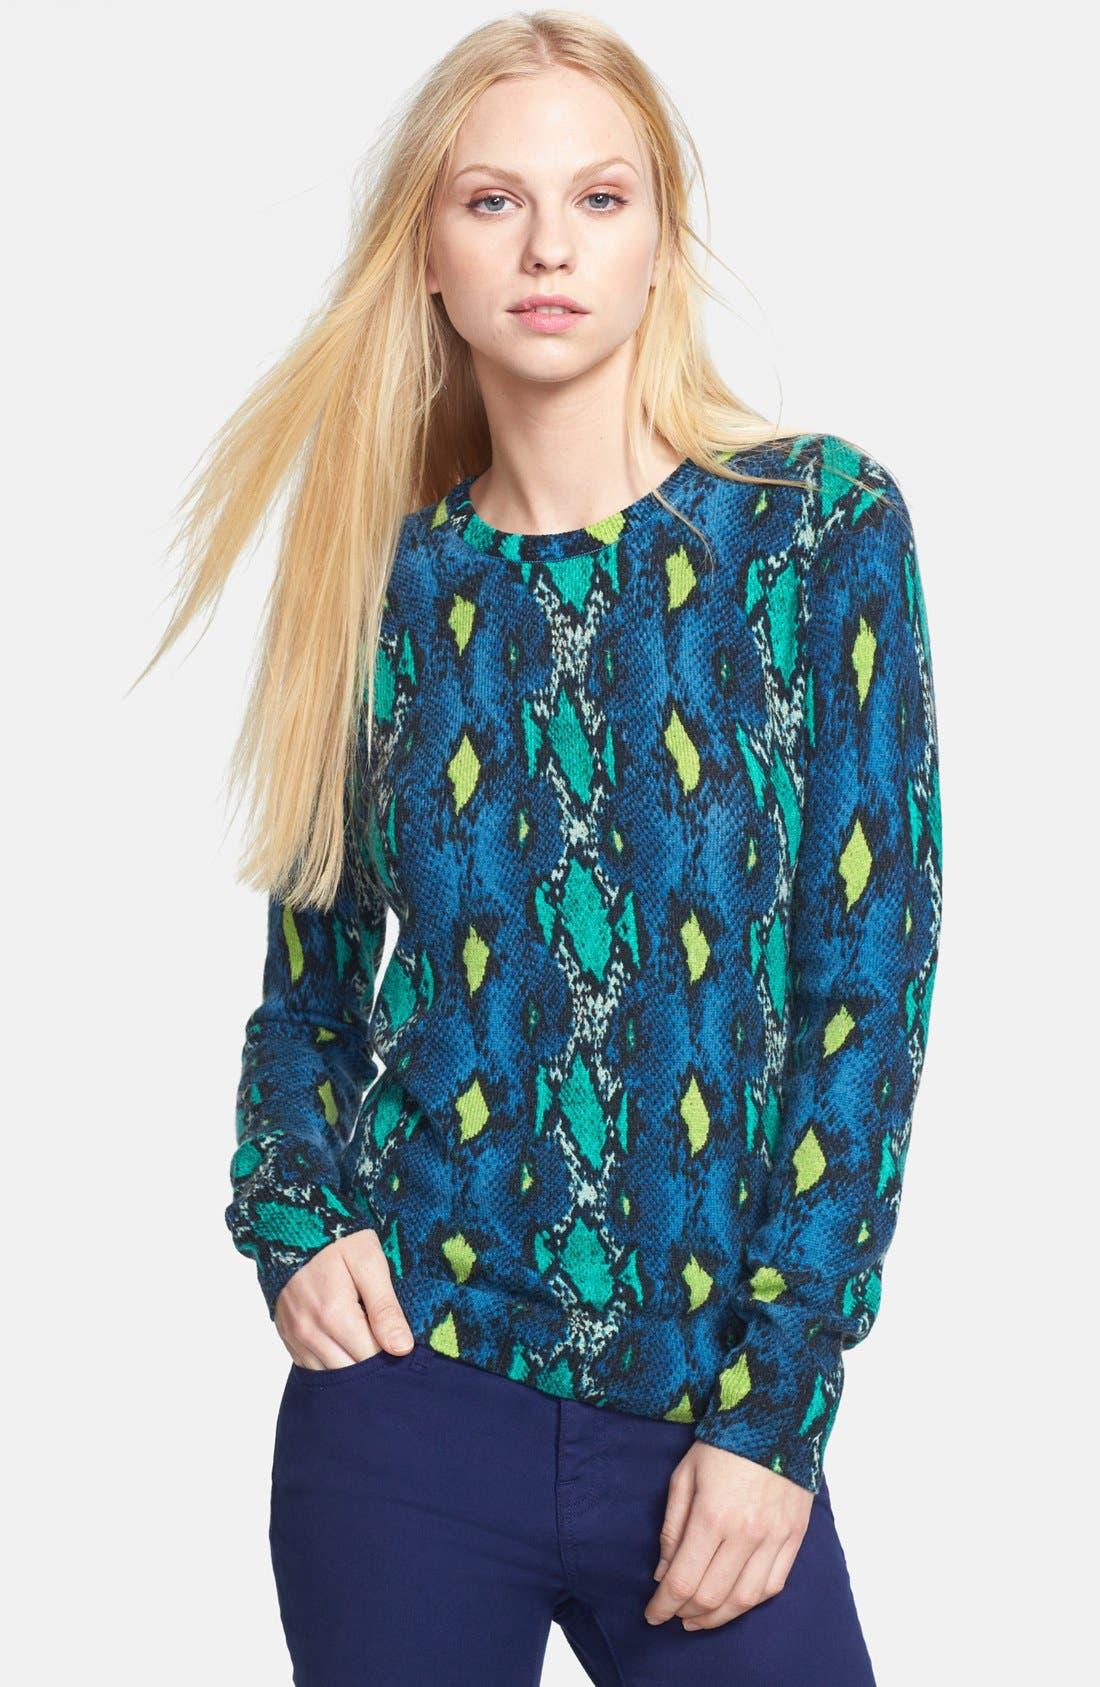 Alternate Image 1 Selected - Equipment 'Sloane' Snake Pattern Cashmere Sweater